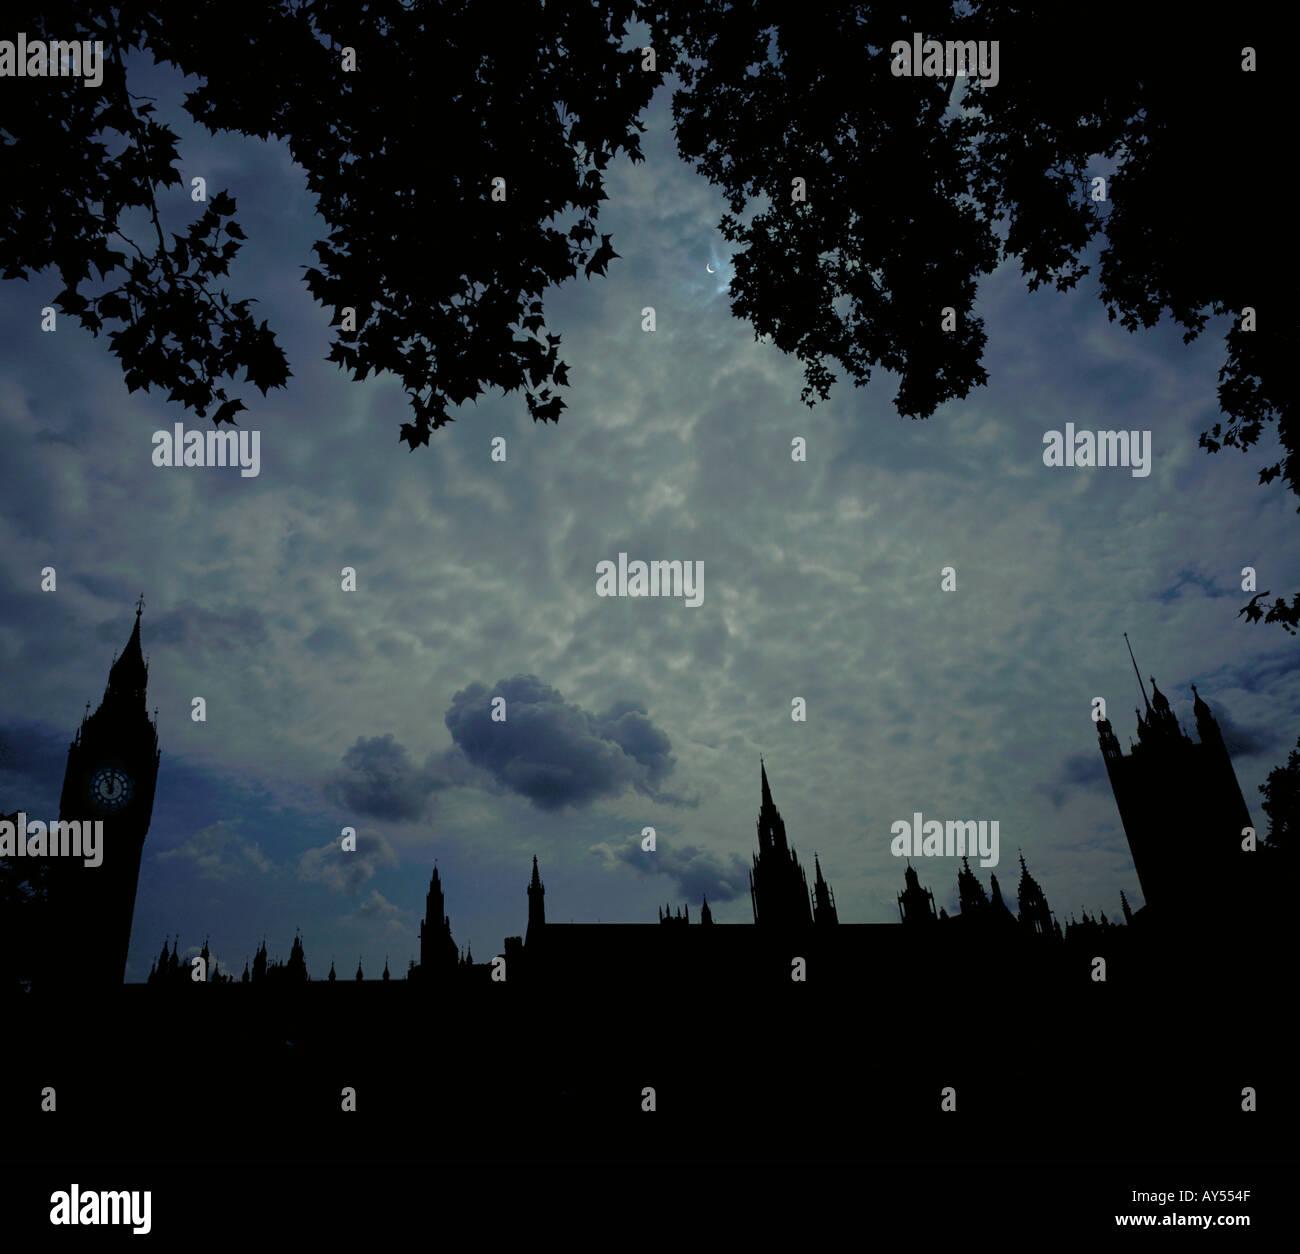 Totale Sonnenfinsternis die Sonne über Häuser des Parlaments London am 11. August 1999 Stockbild